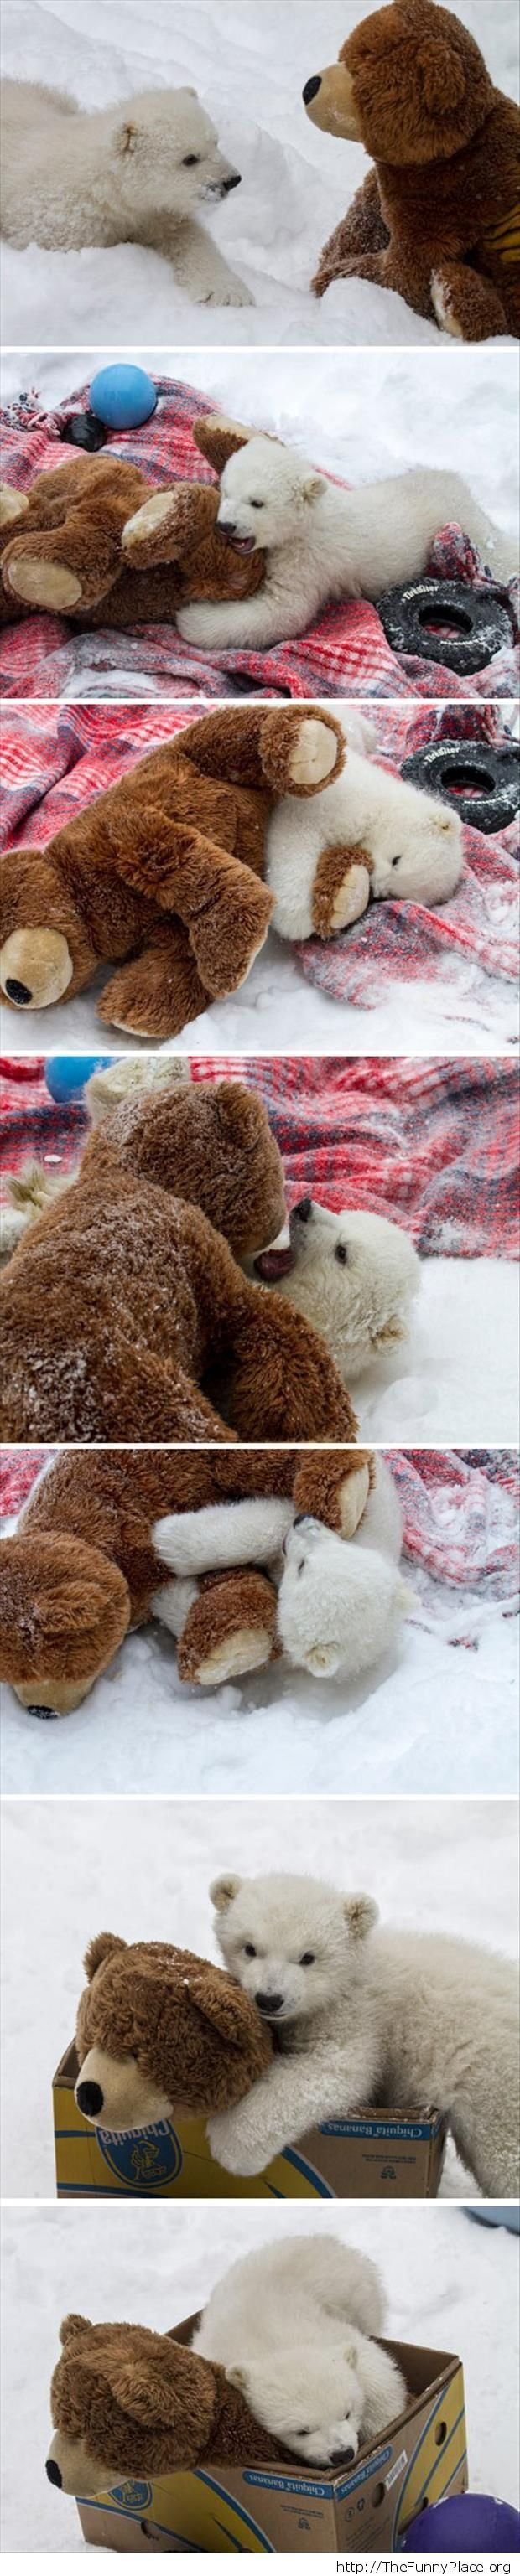 Cute baby bear playing